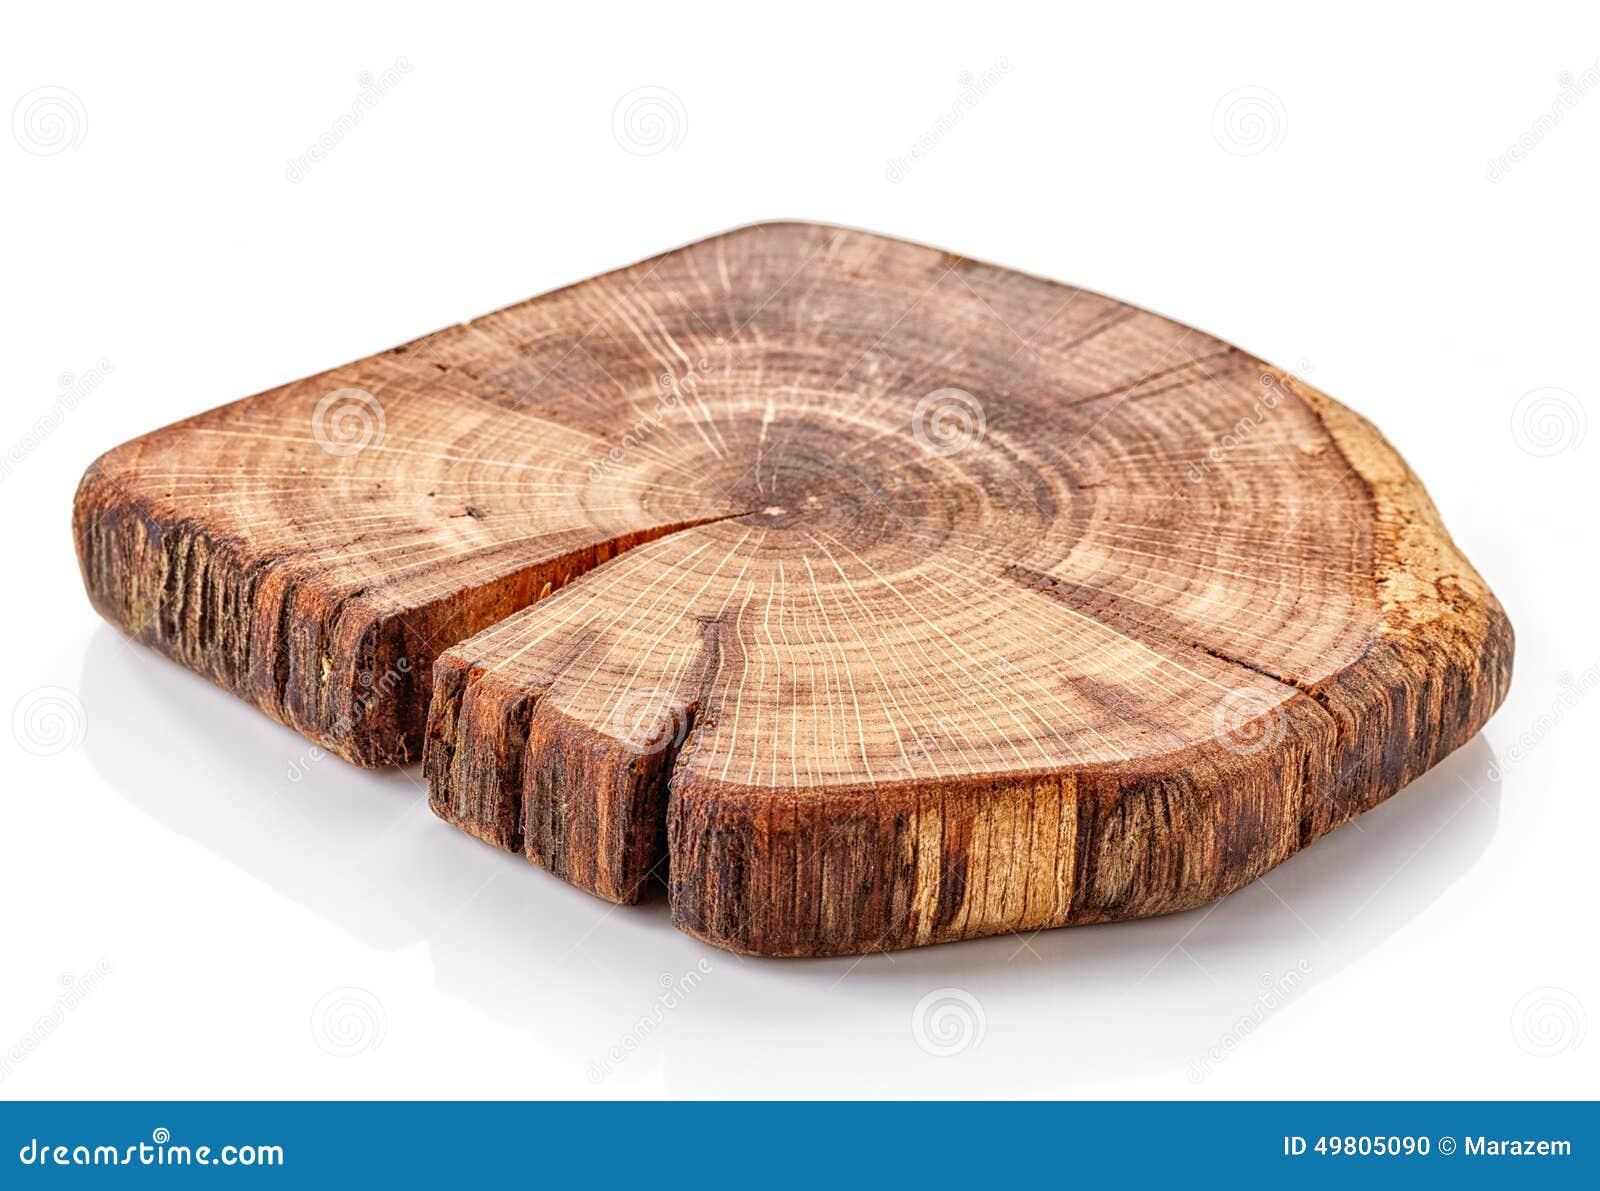 petite palette en bois photo stock image du r clame. Black Bedroom Furniture Sets. Home Design Ideas